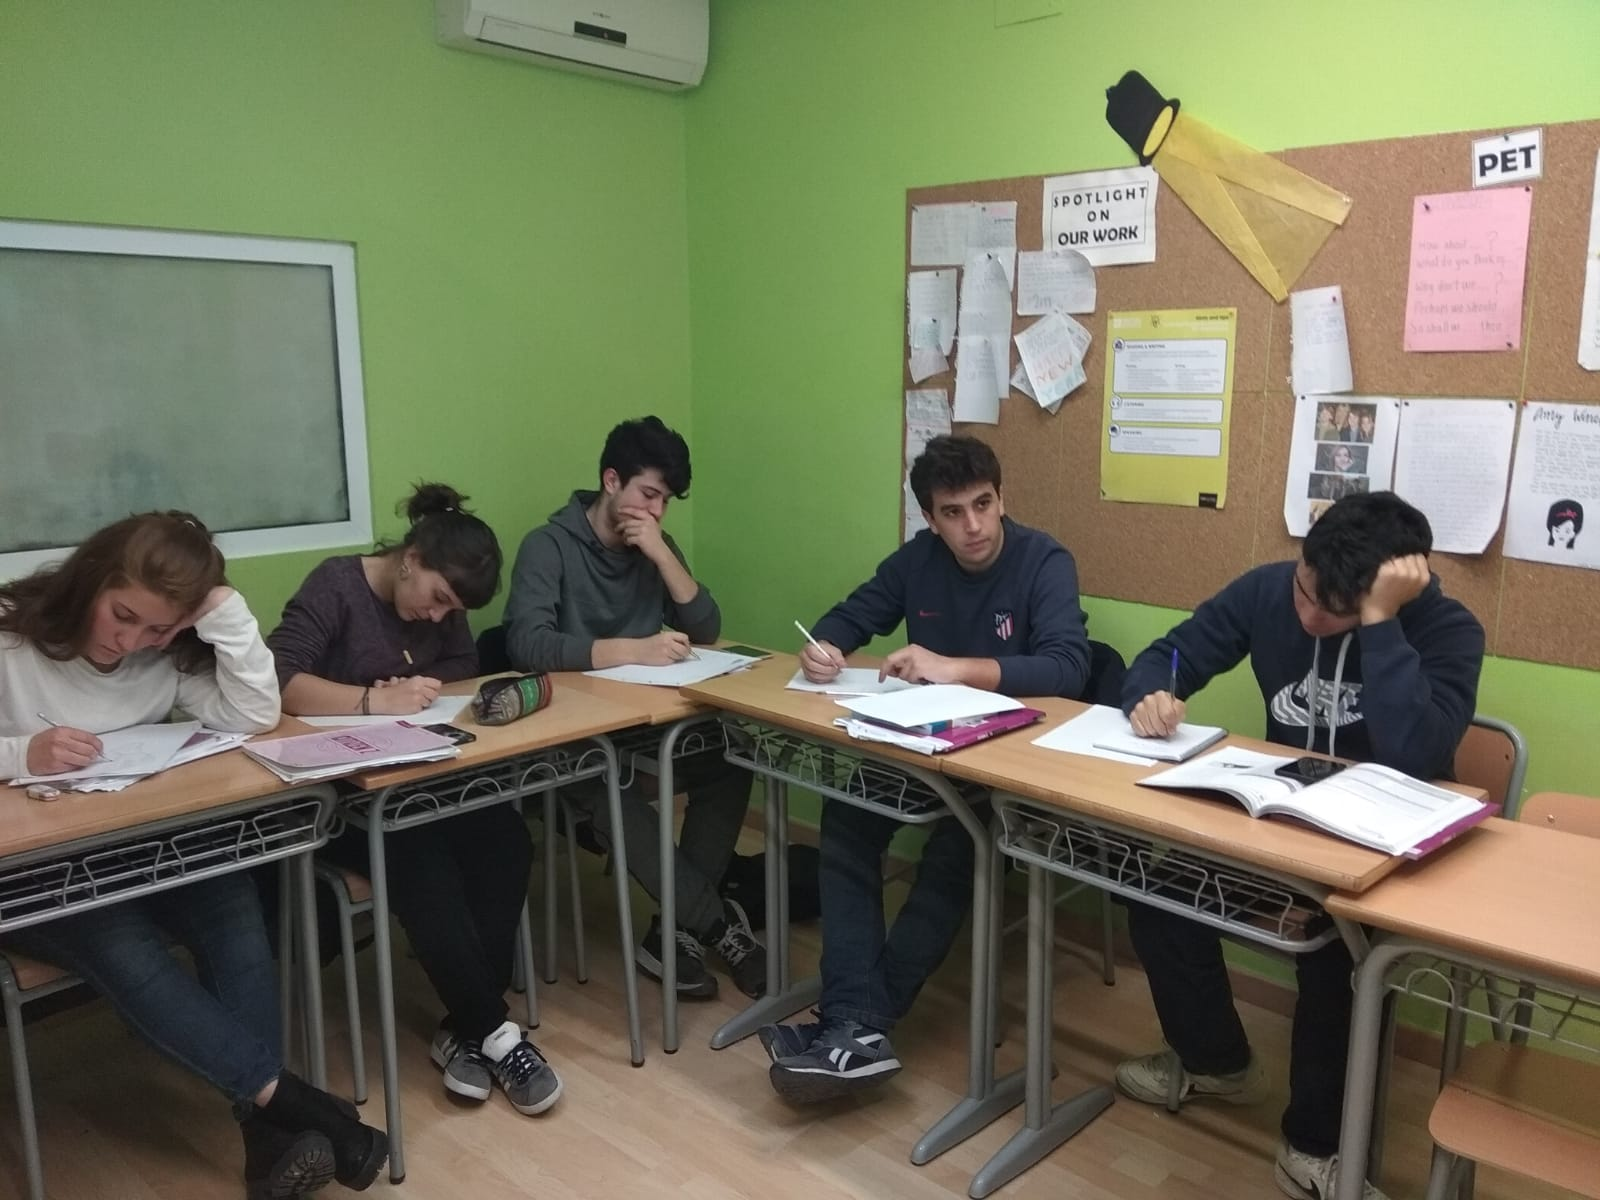 Resumen CAE 1 y CAE 2 Febrero 2019 – Centro Baleares